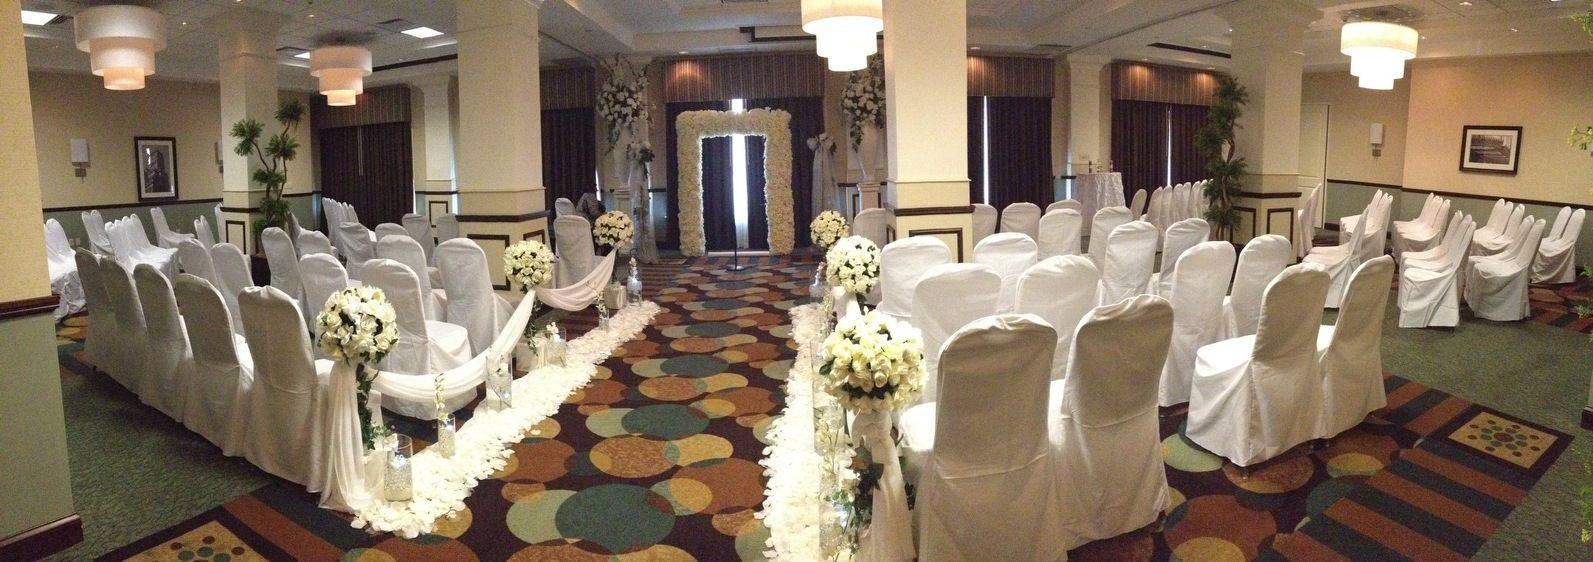 Wedding Reception Venues King Edward Hotel Jackson Ms Weddings